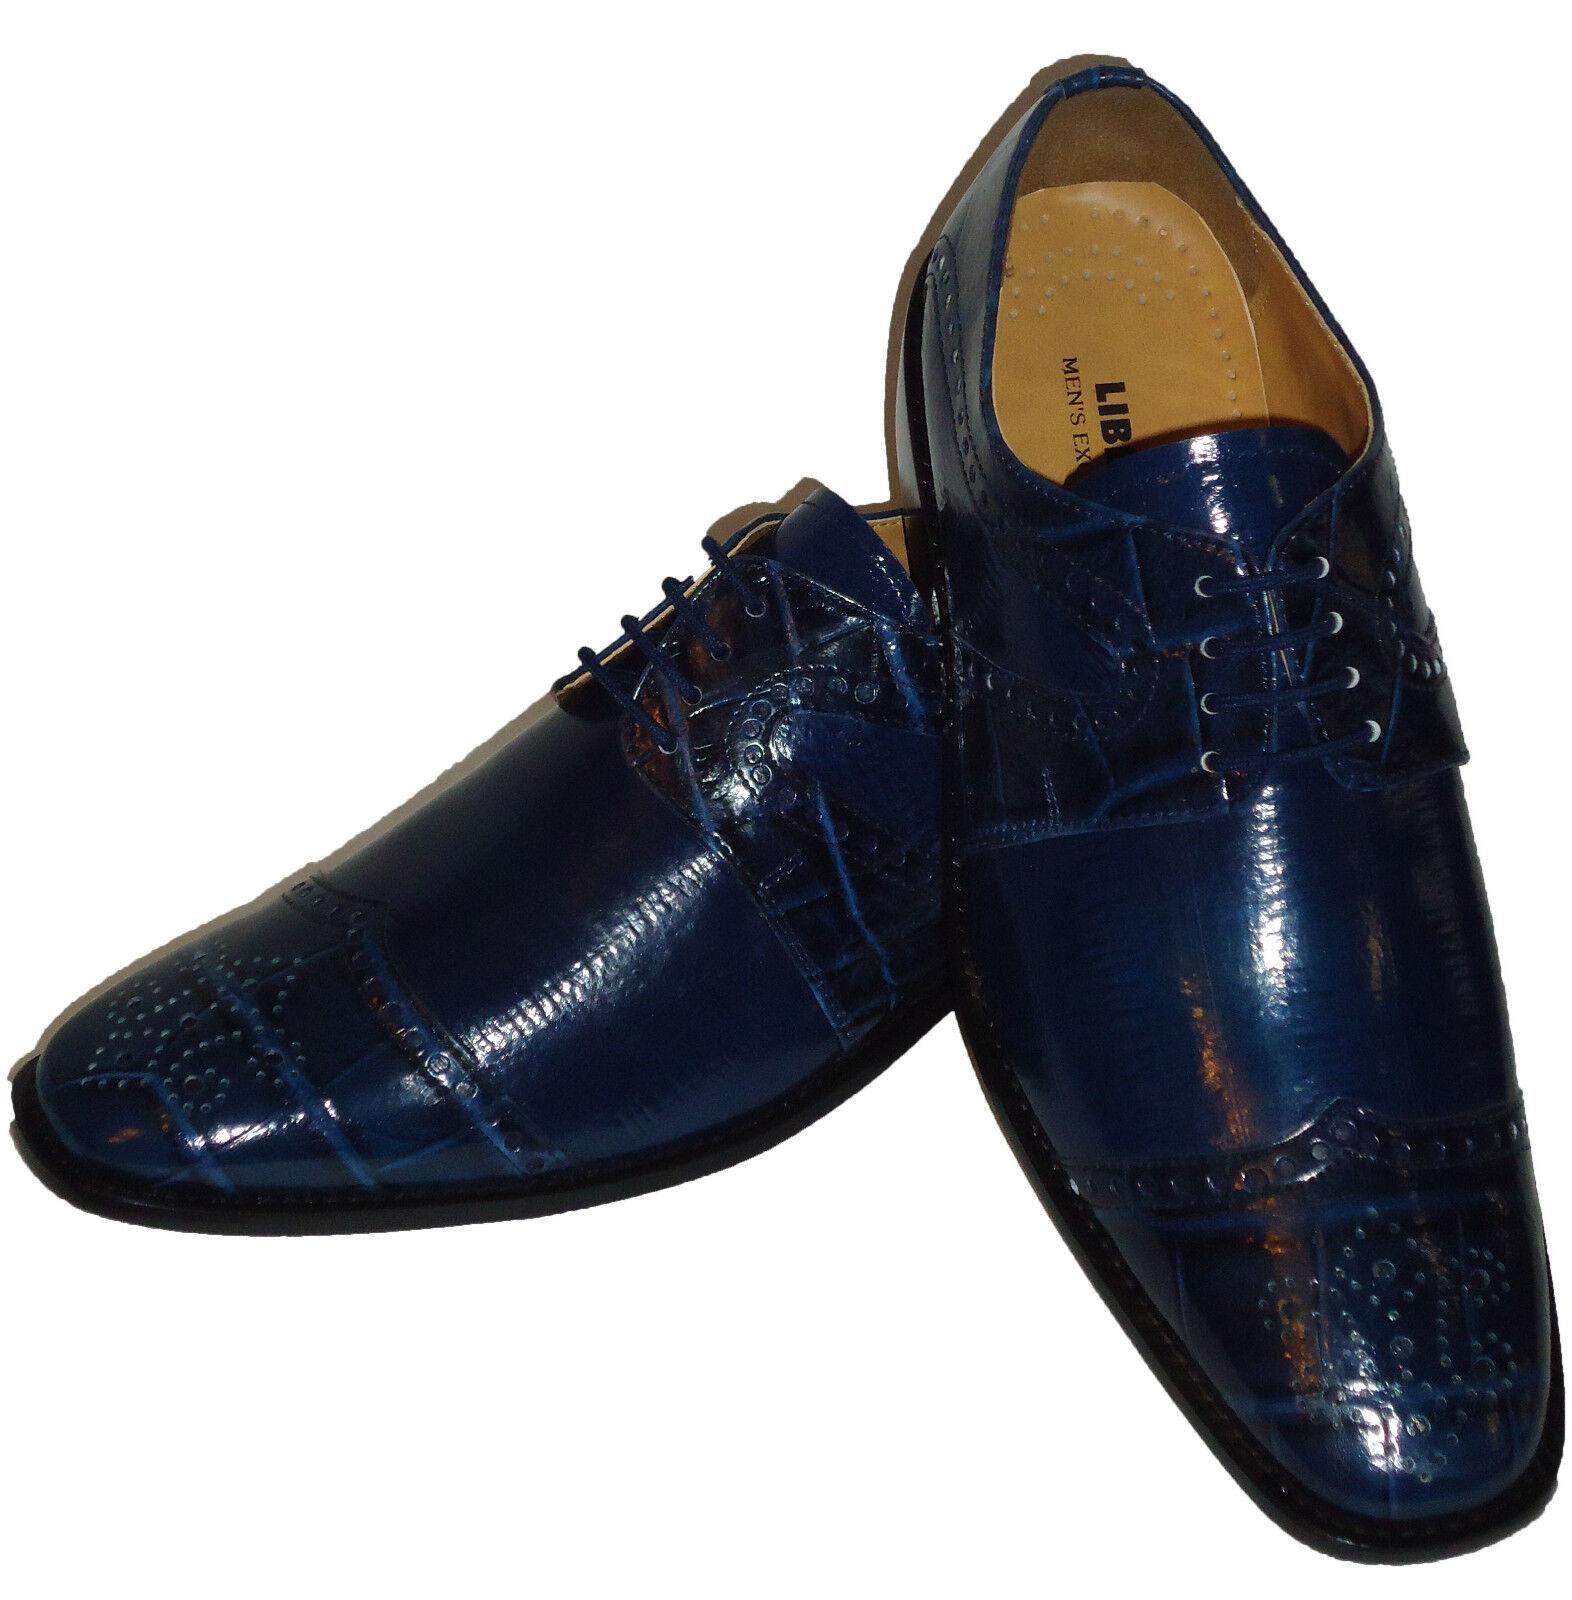 Liberty LS1045 Mens Spectator Fashion Dress shoes Most Elegant Navy bluee